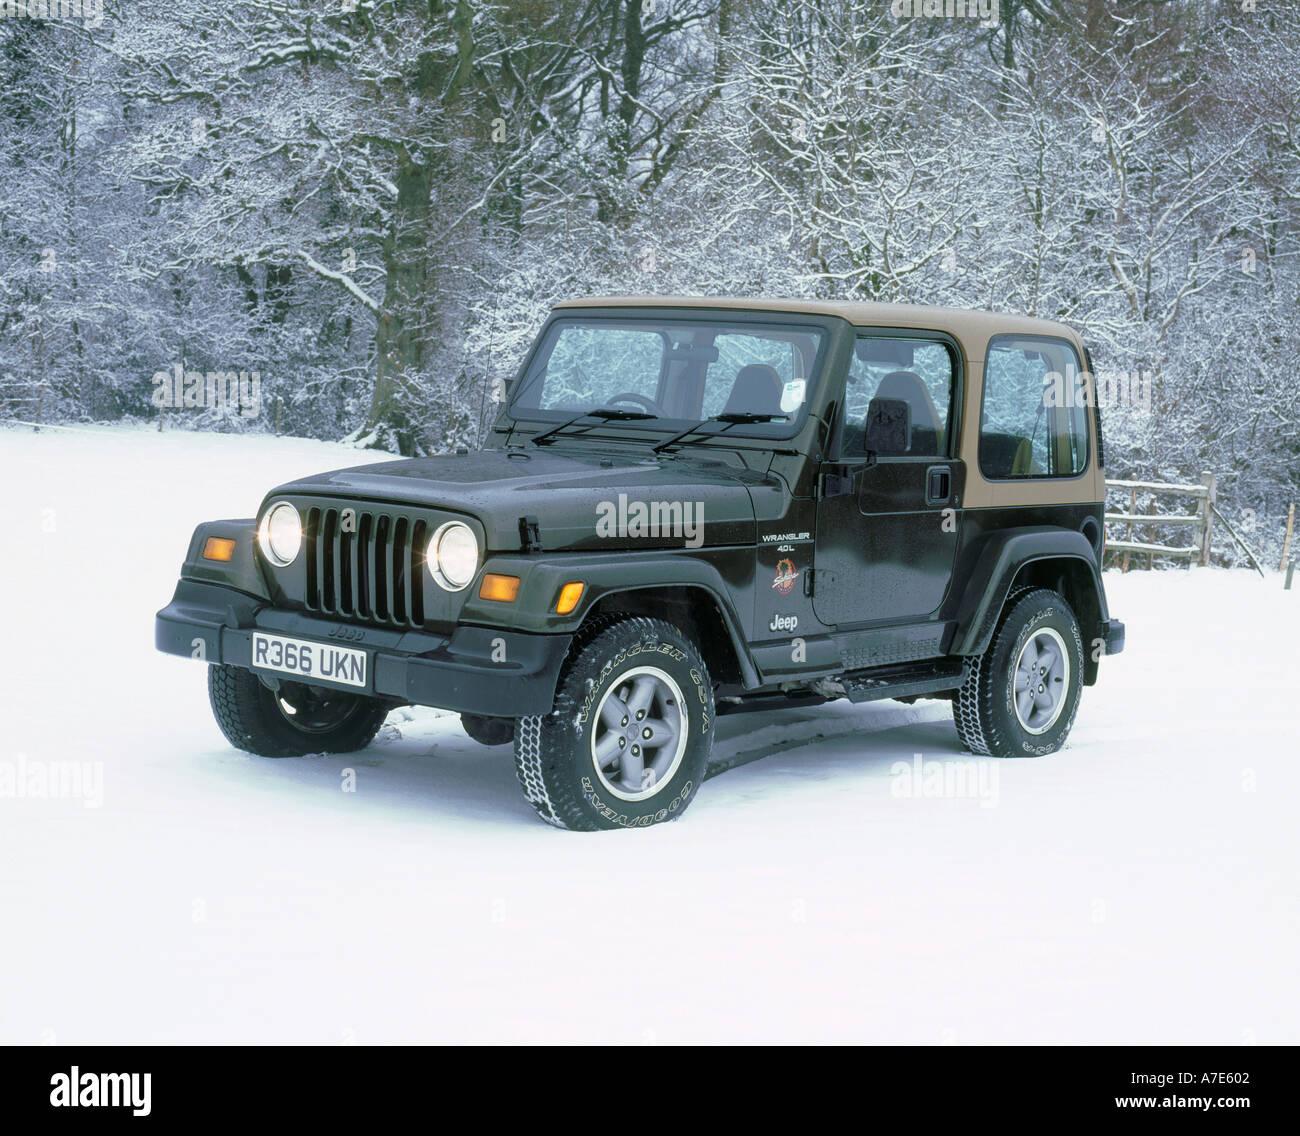 Awesome 1997 Jeep Wrangler Sahara